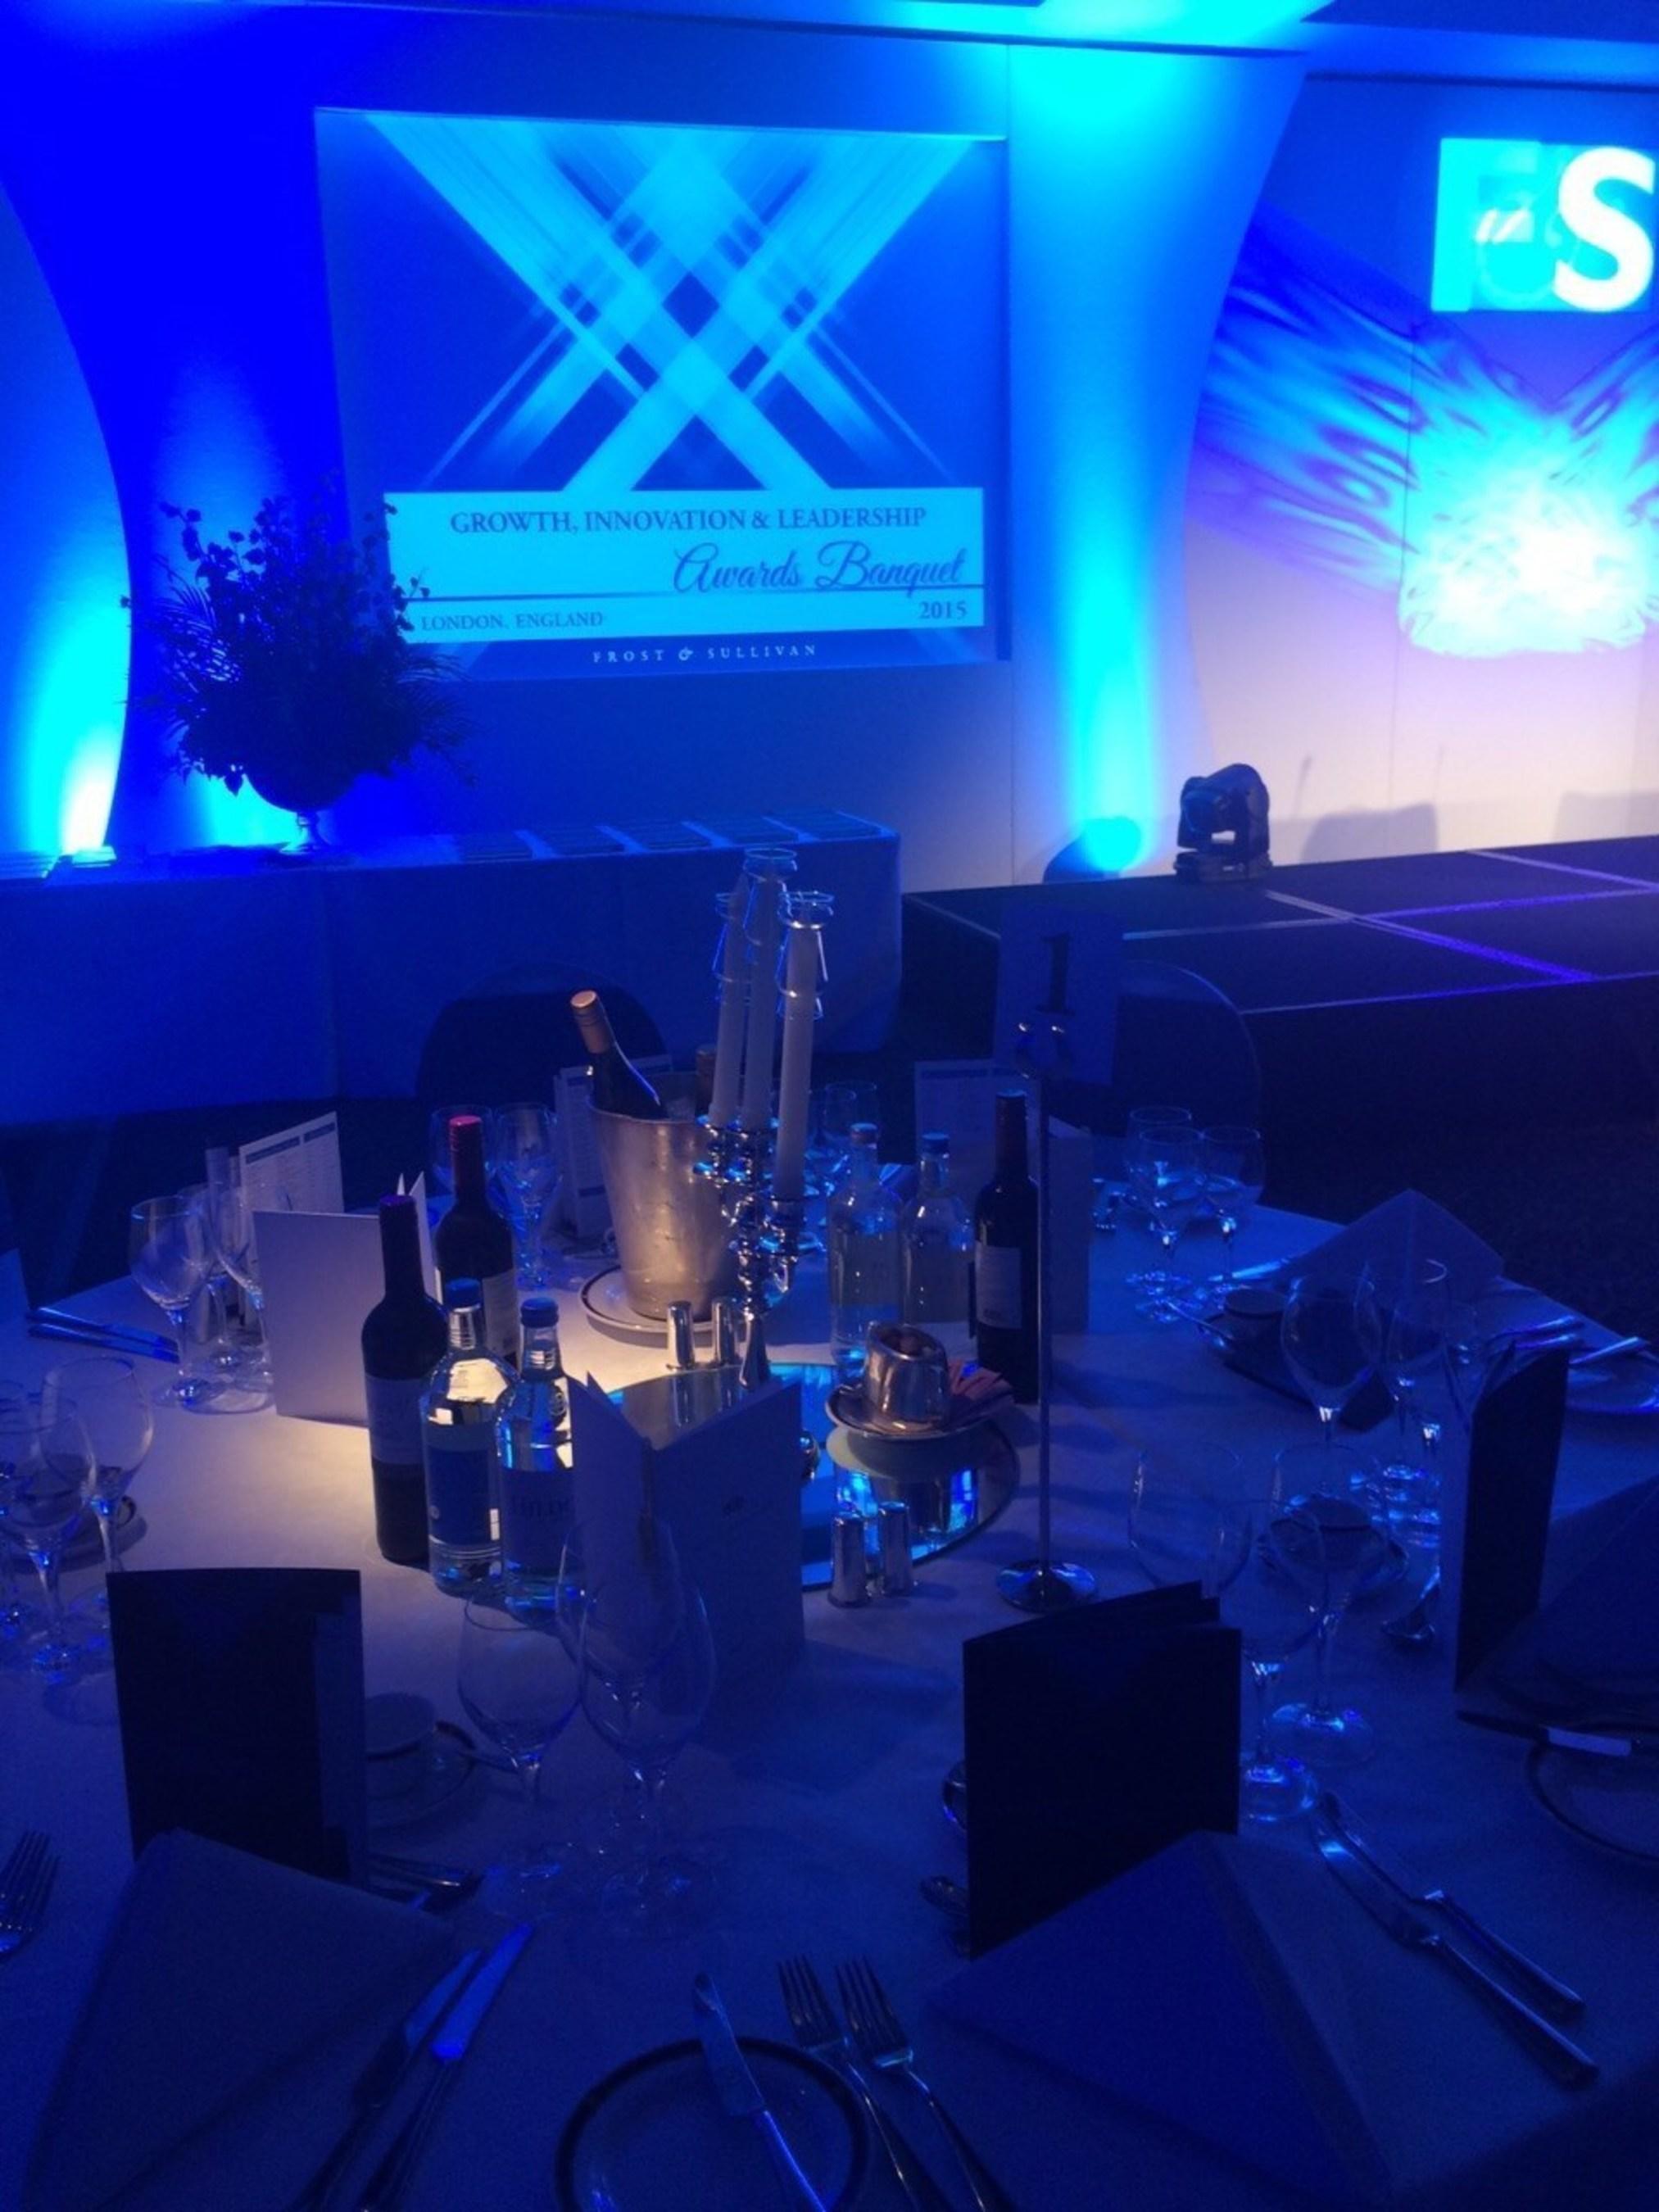 Industry Trailblazers Honoured at Frost & Sullivan's Best Practices Awards Banquet